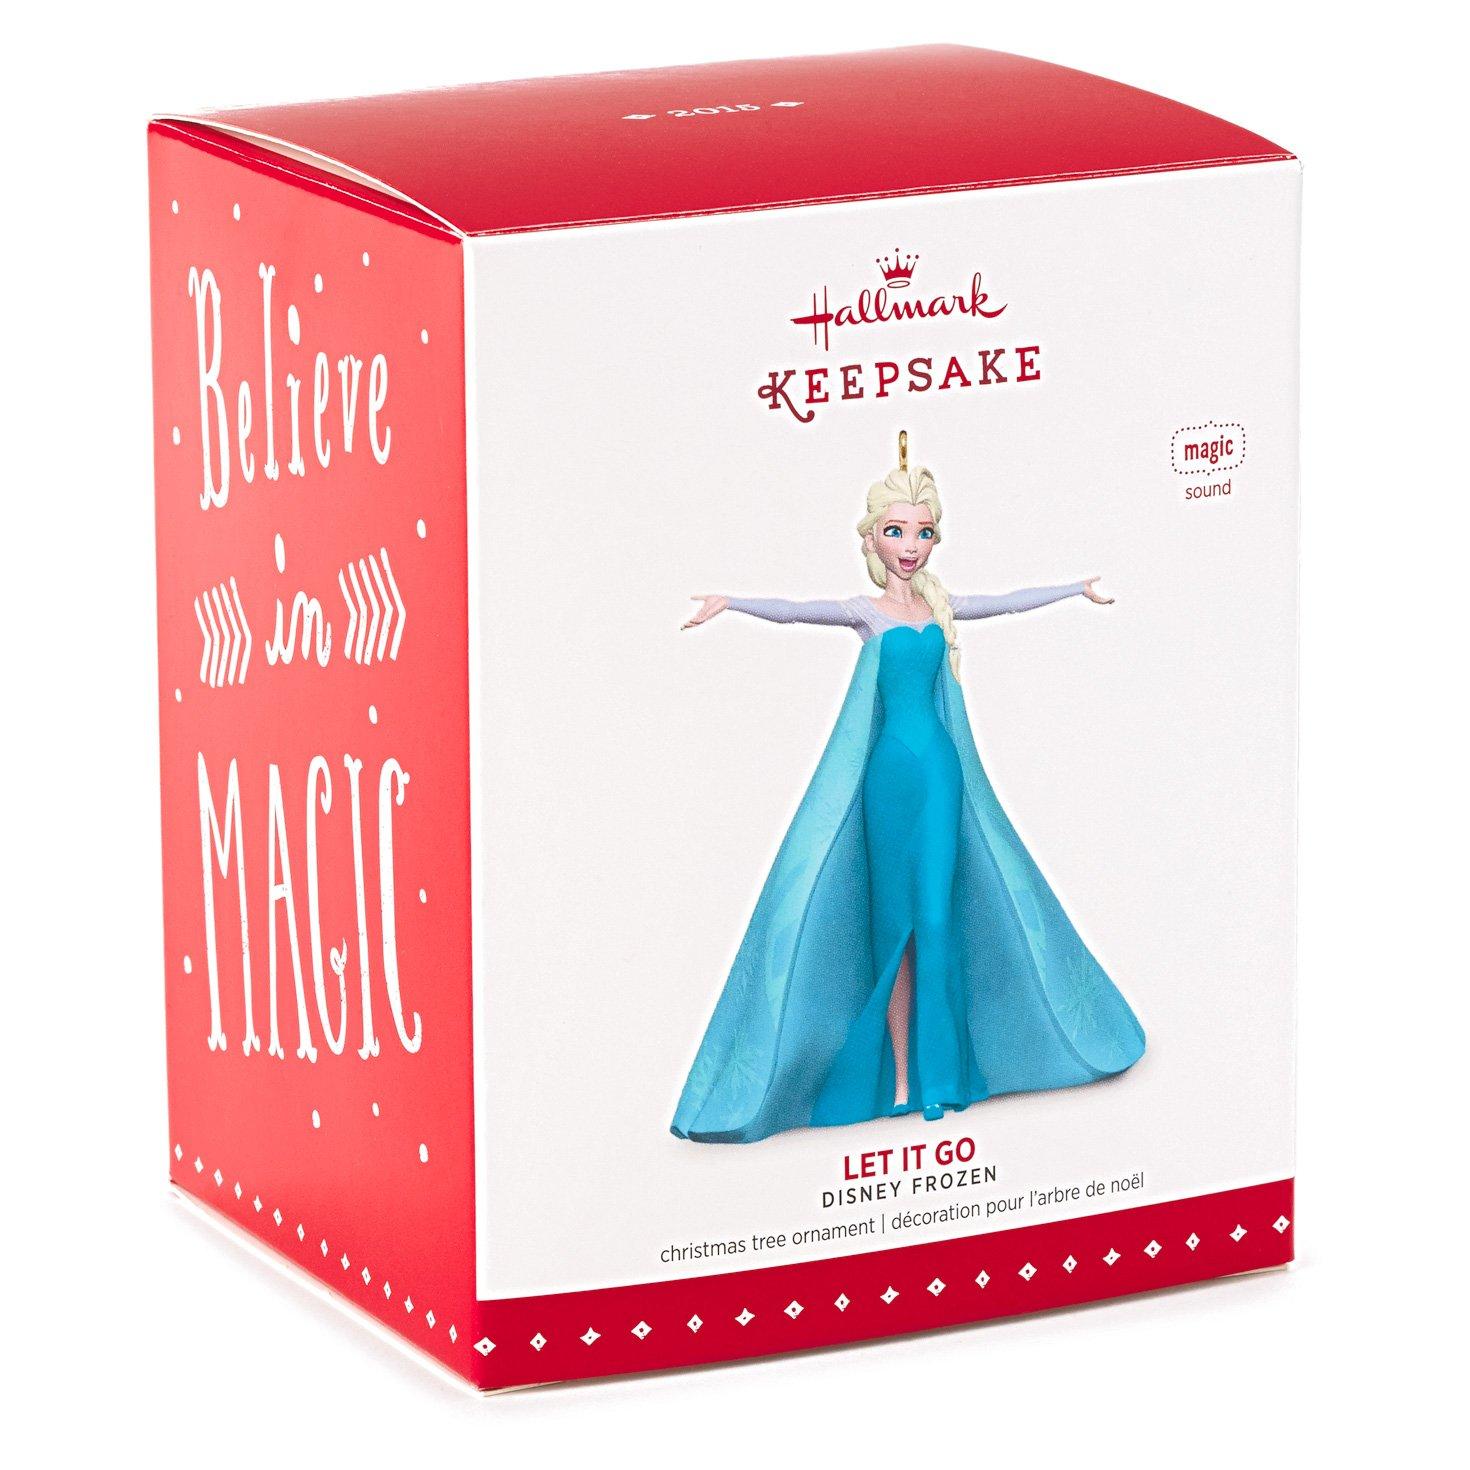 Amazoncom Hallmark Keepsake Ornament Disney Frozen Let It Go Queen